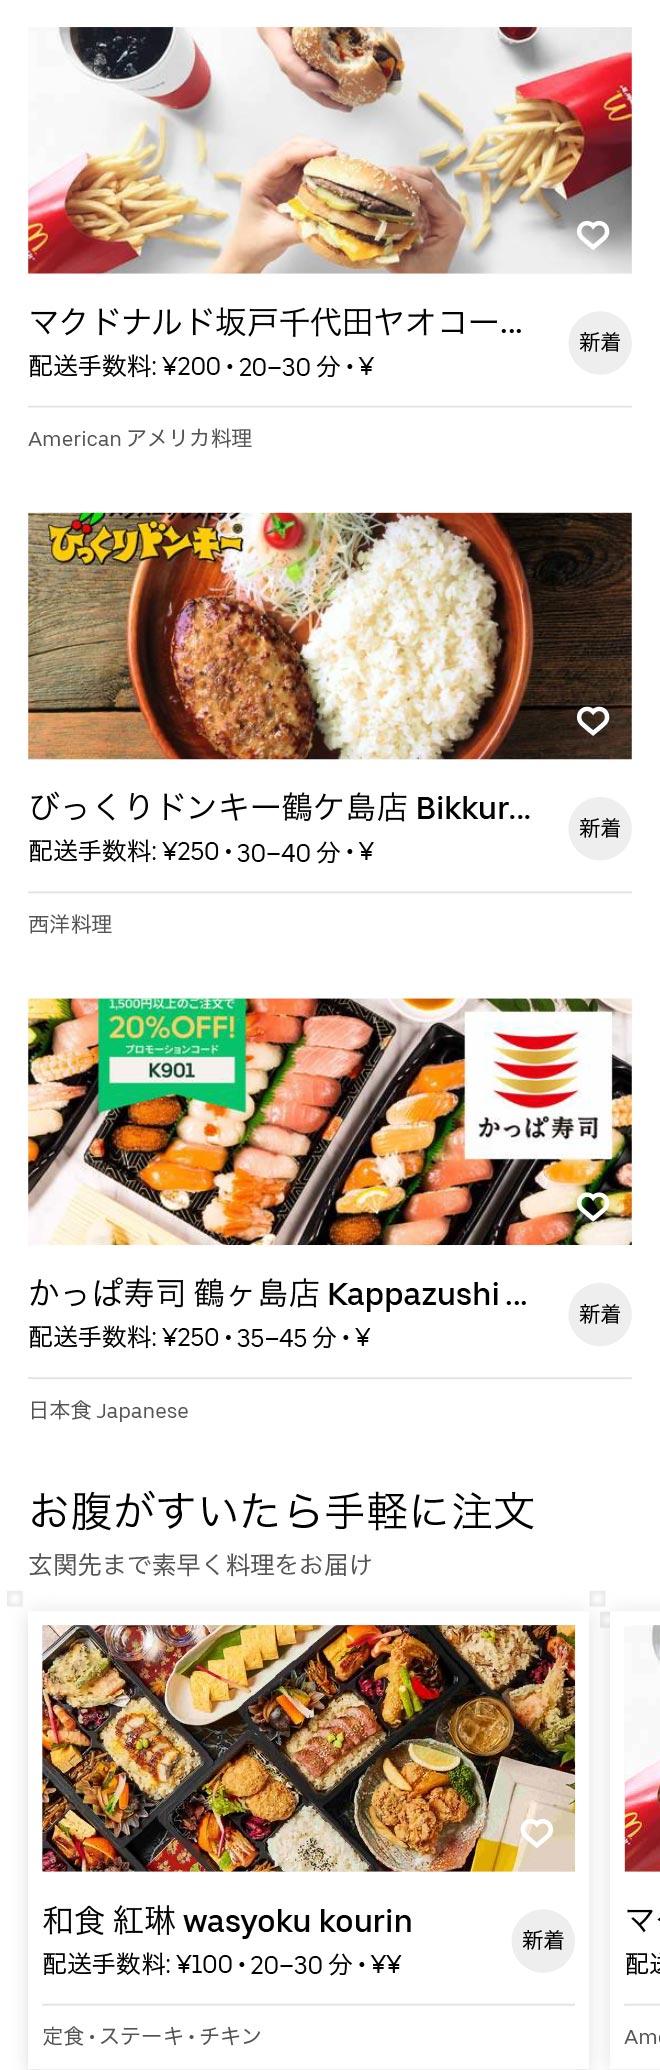 Sakado menu 2010 01